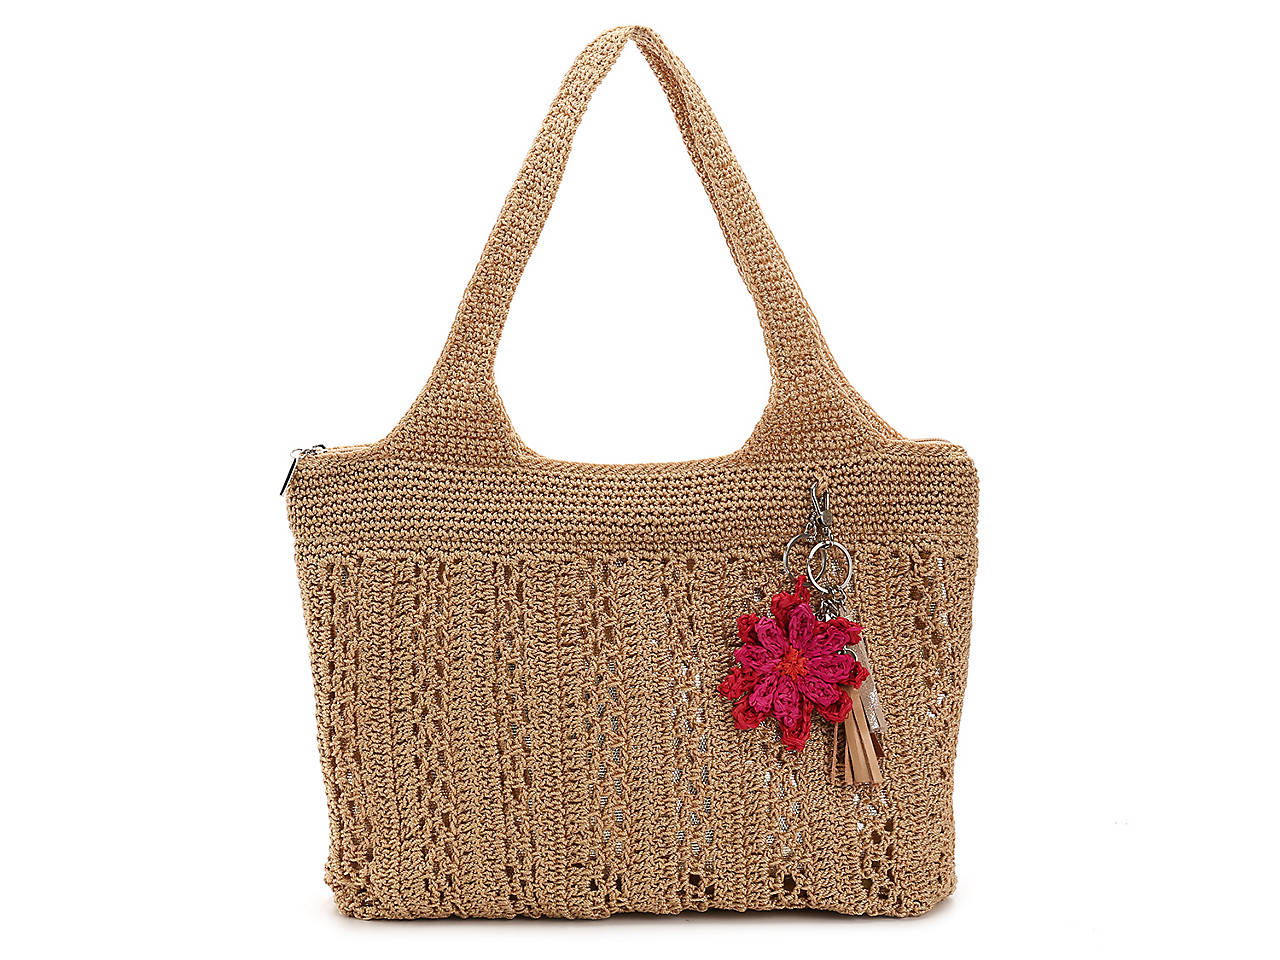 The Sak Crochet Shoulder Bag Womens Handbags Accessories Dsw